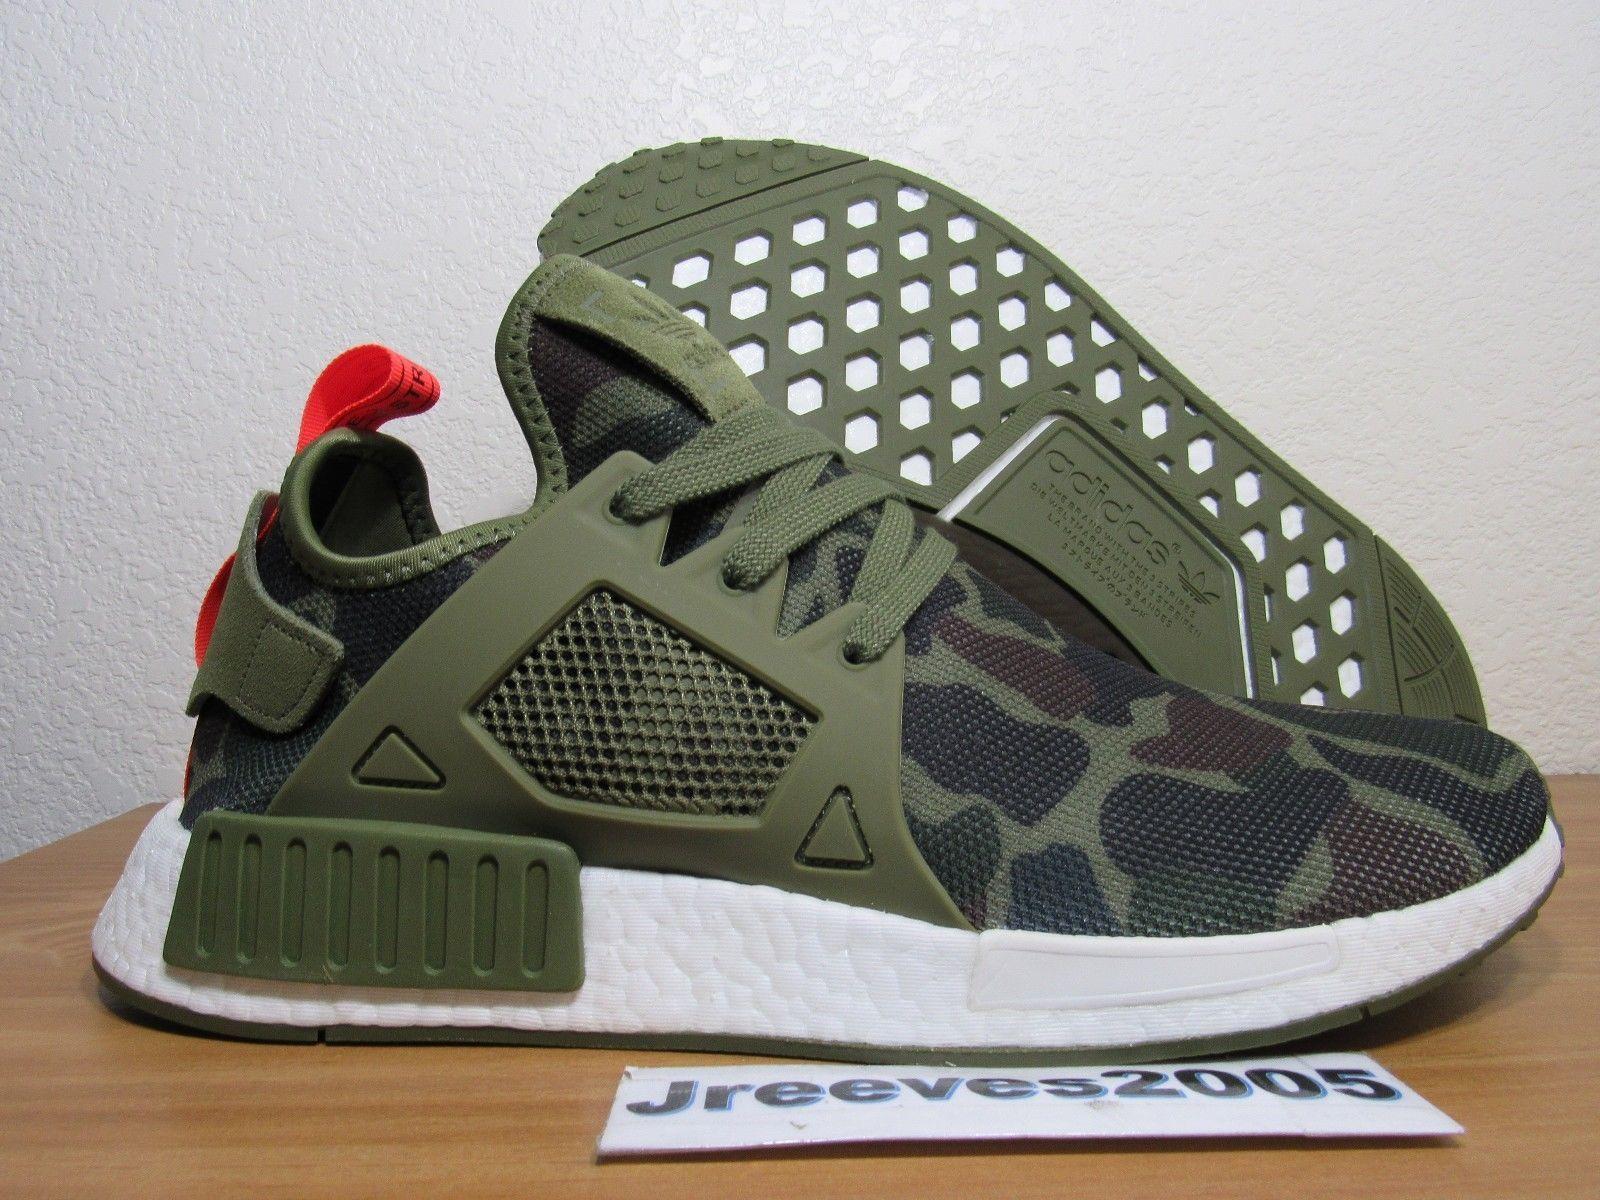 adidas nmd bape for sale adidas yeezy boost 350